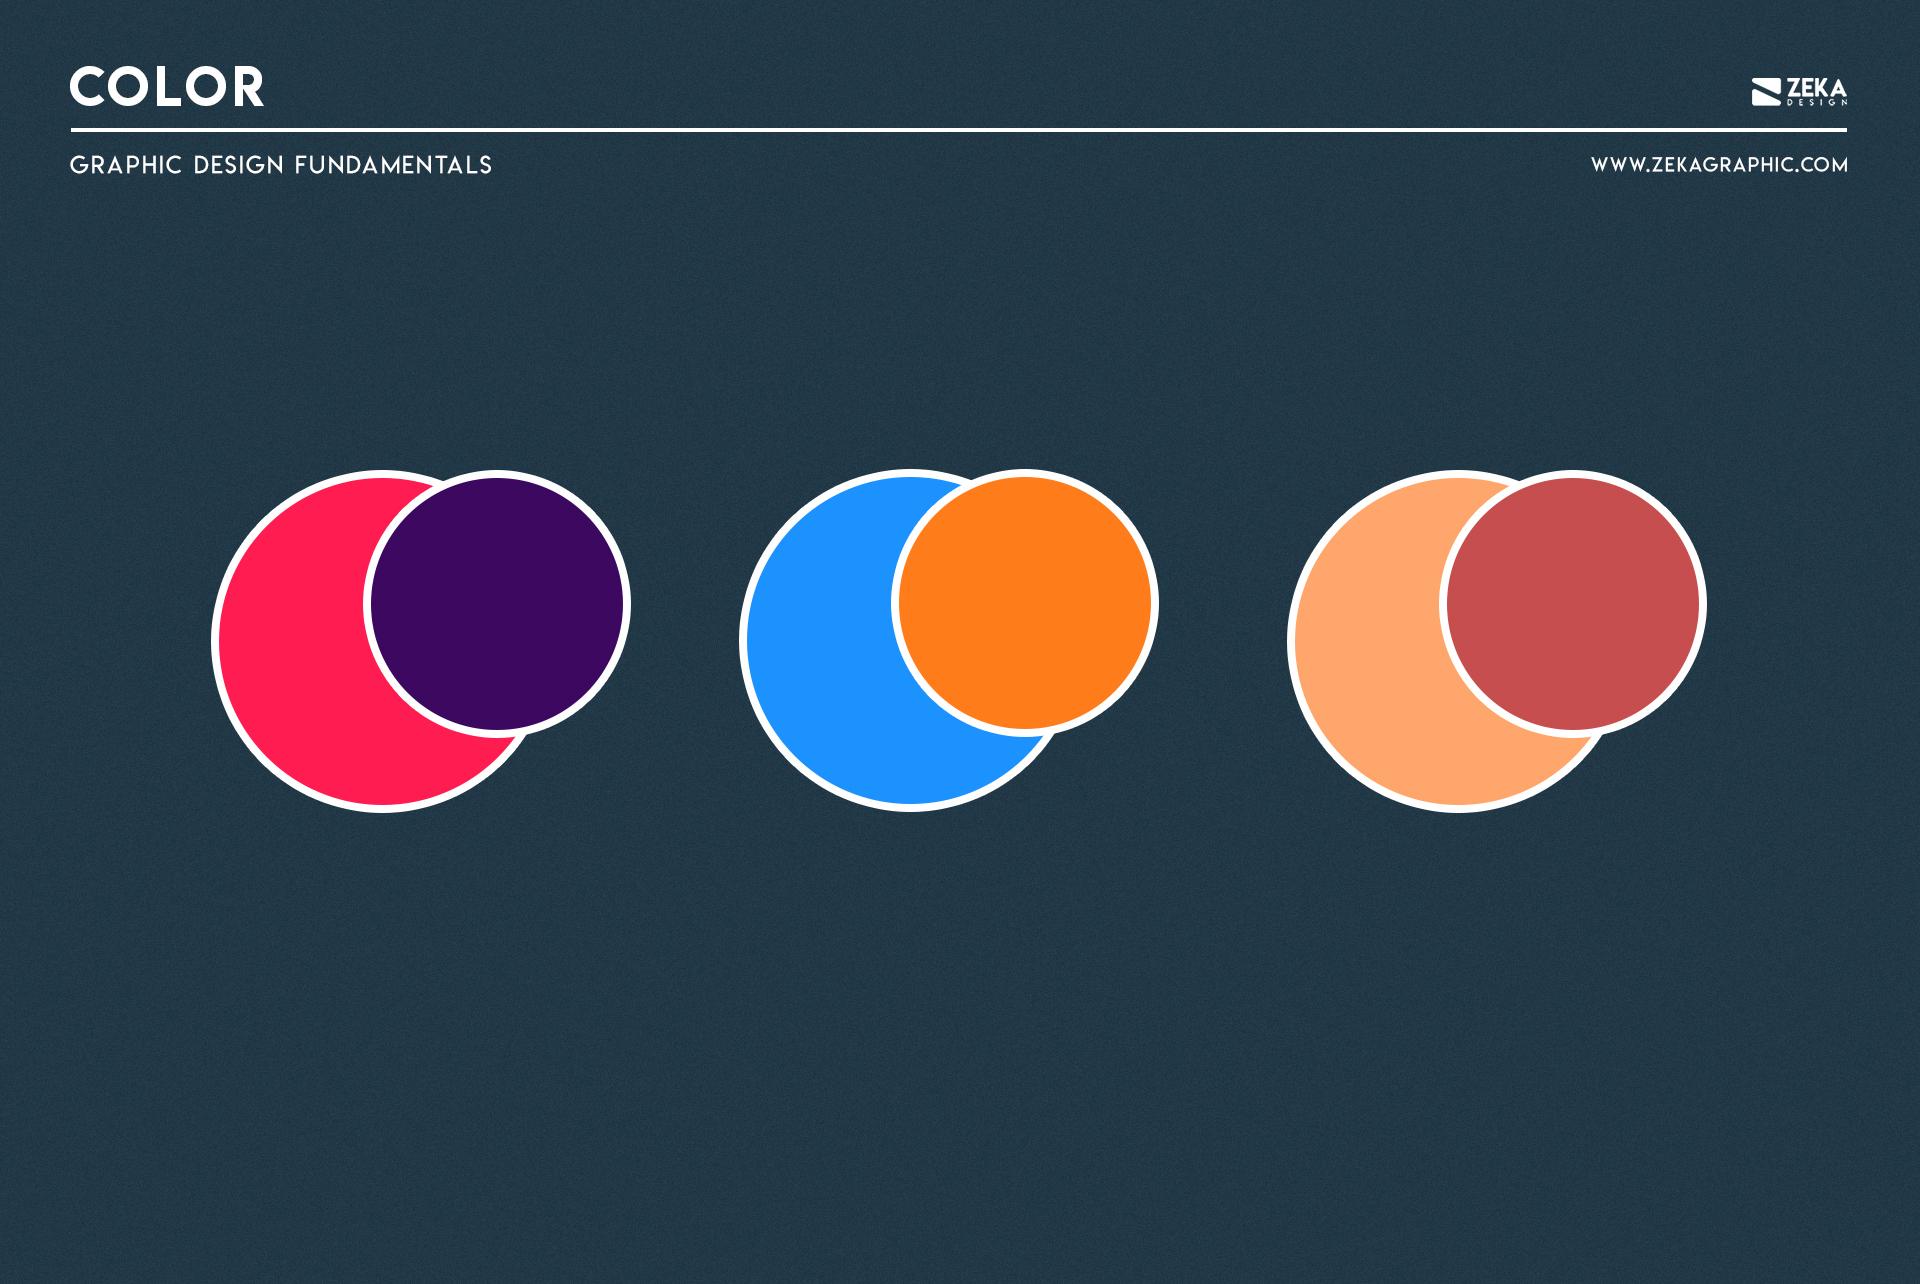 Color Graphic Design Fundamental Elements